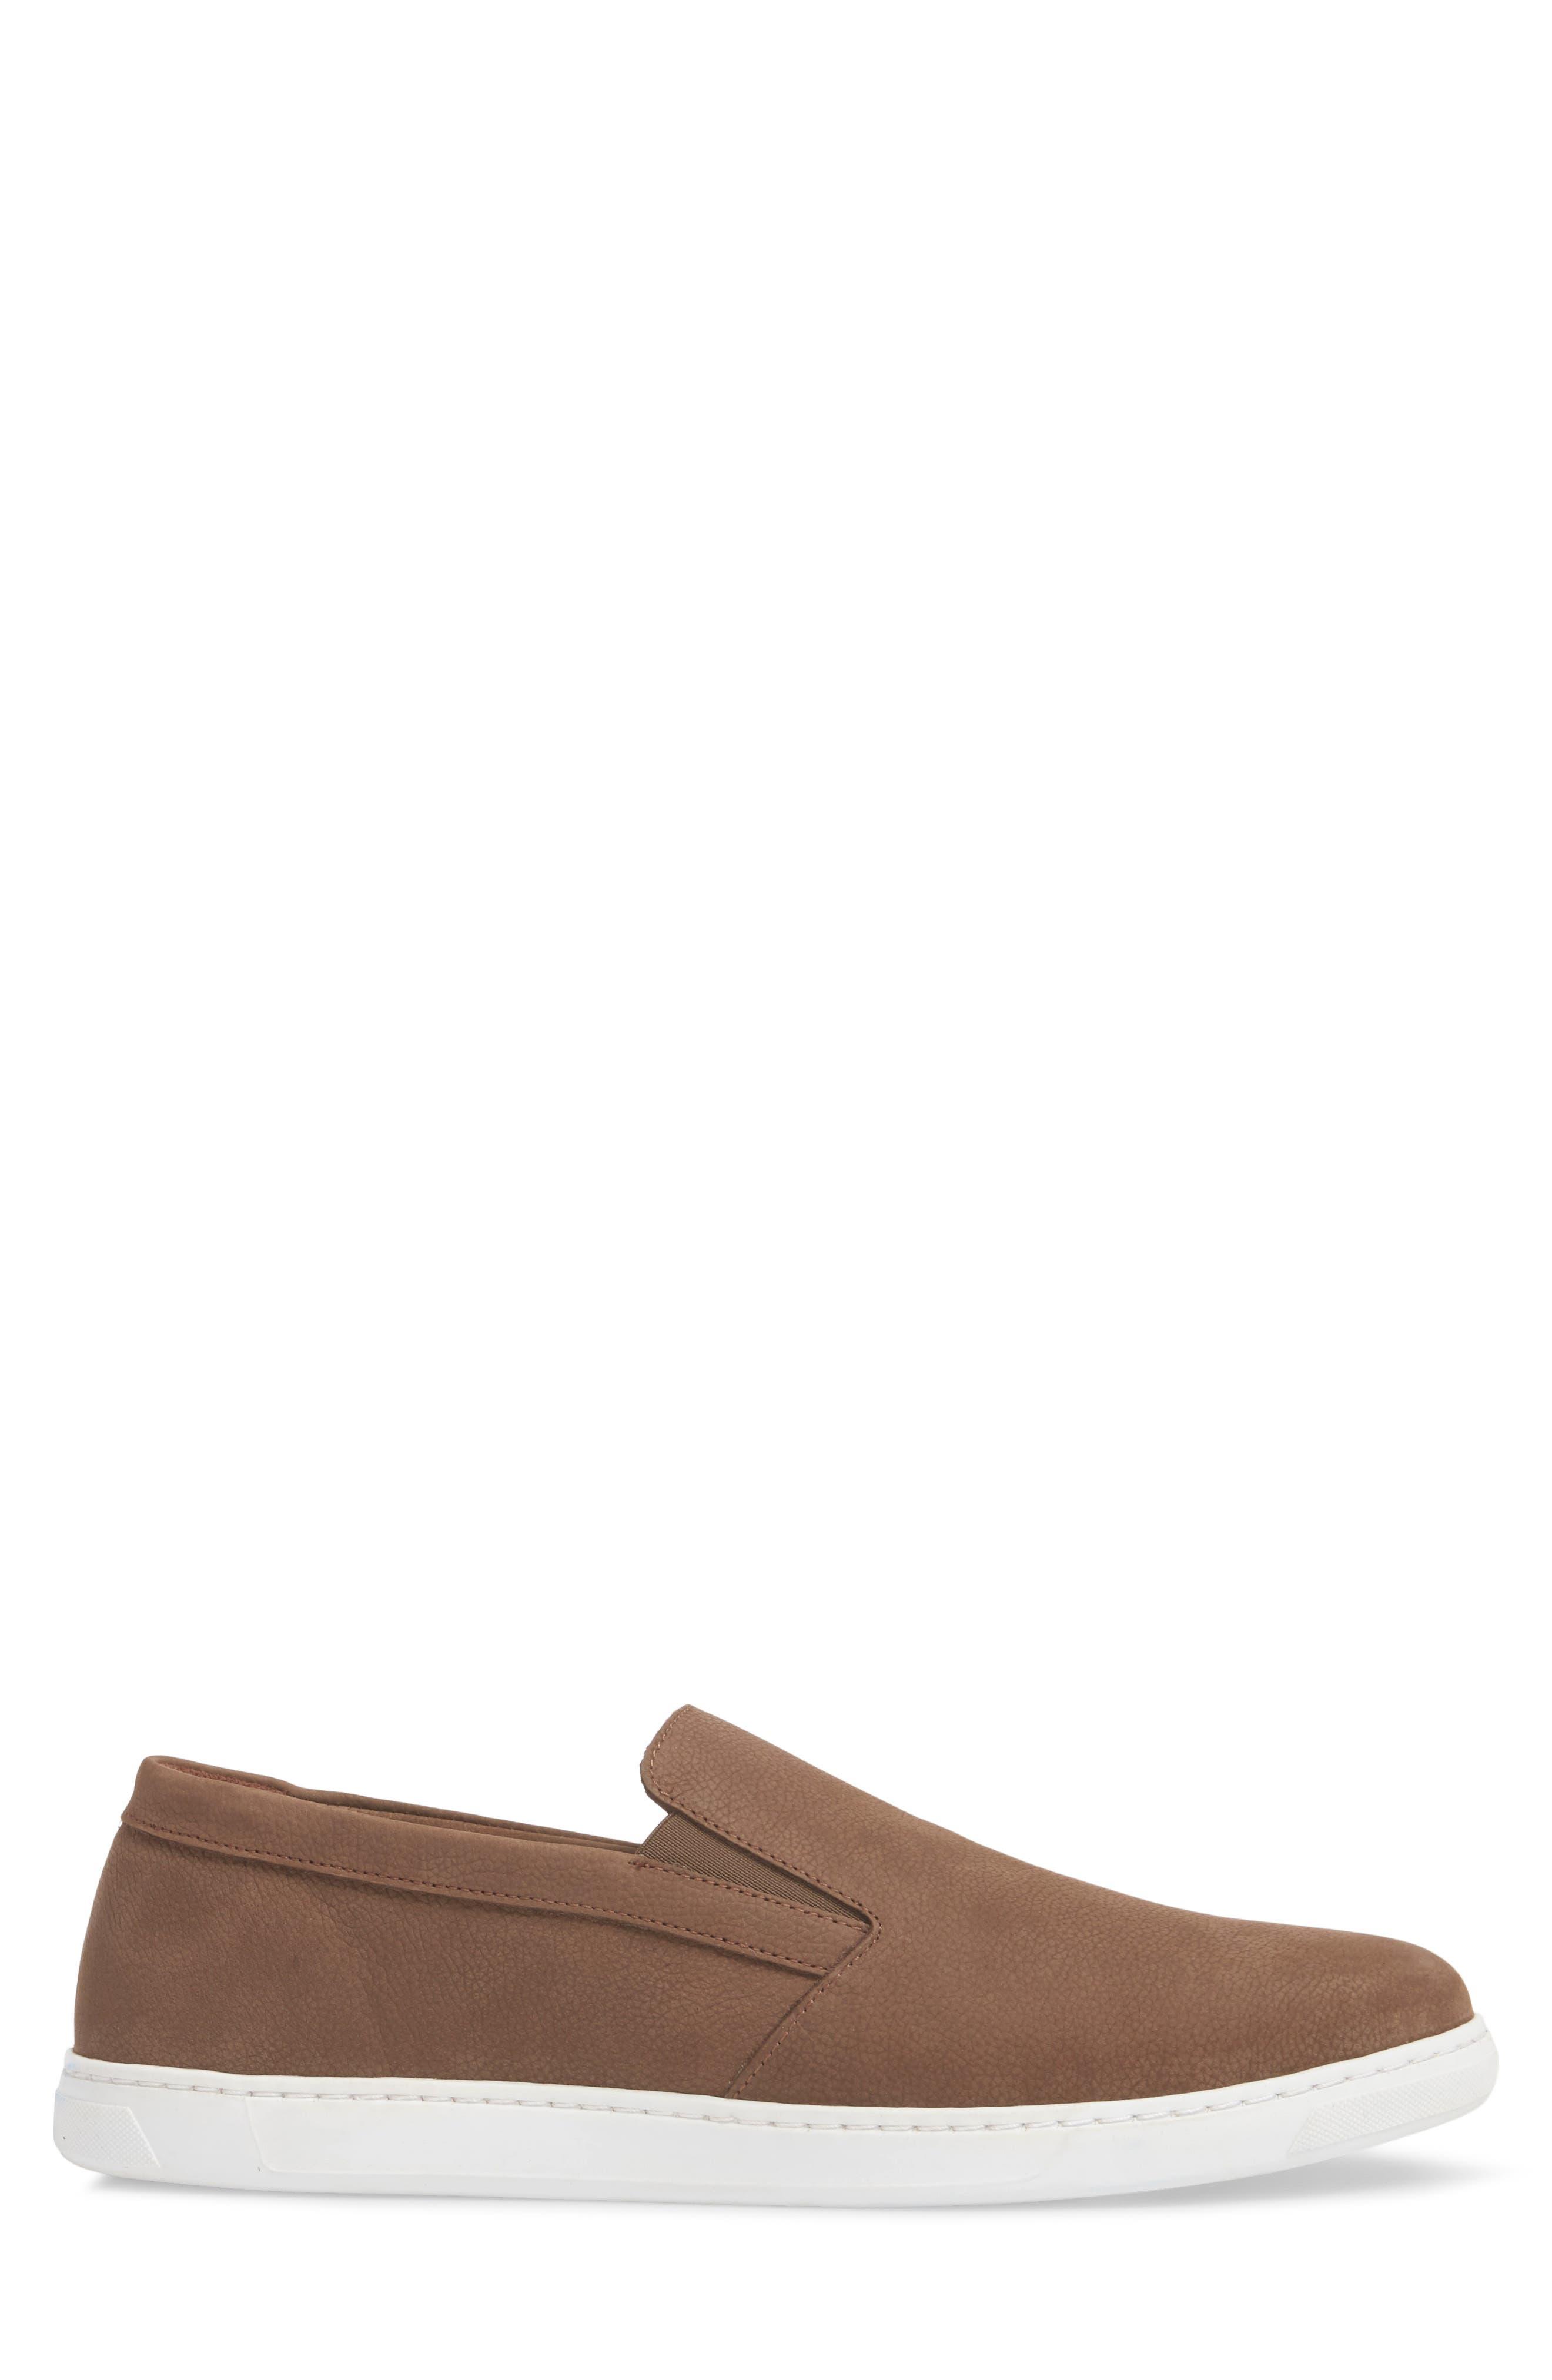 Neff Slip-On Sneaker,                             Alternate thumbnail 3, color,                             Taupe Leather